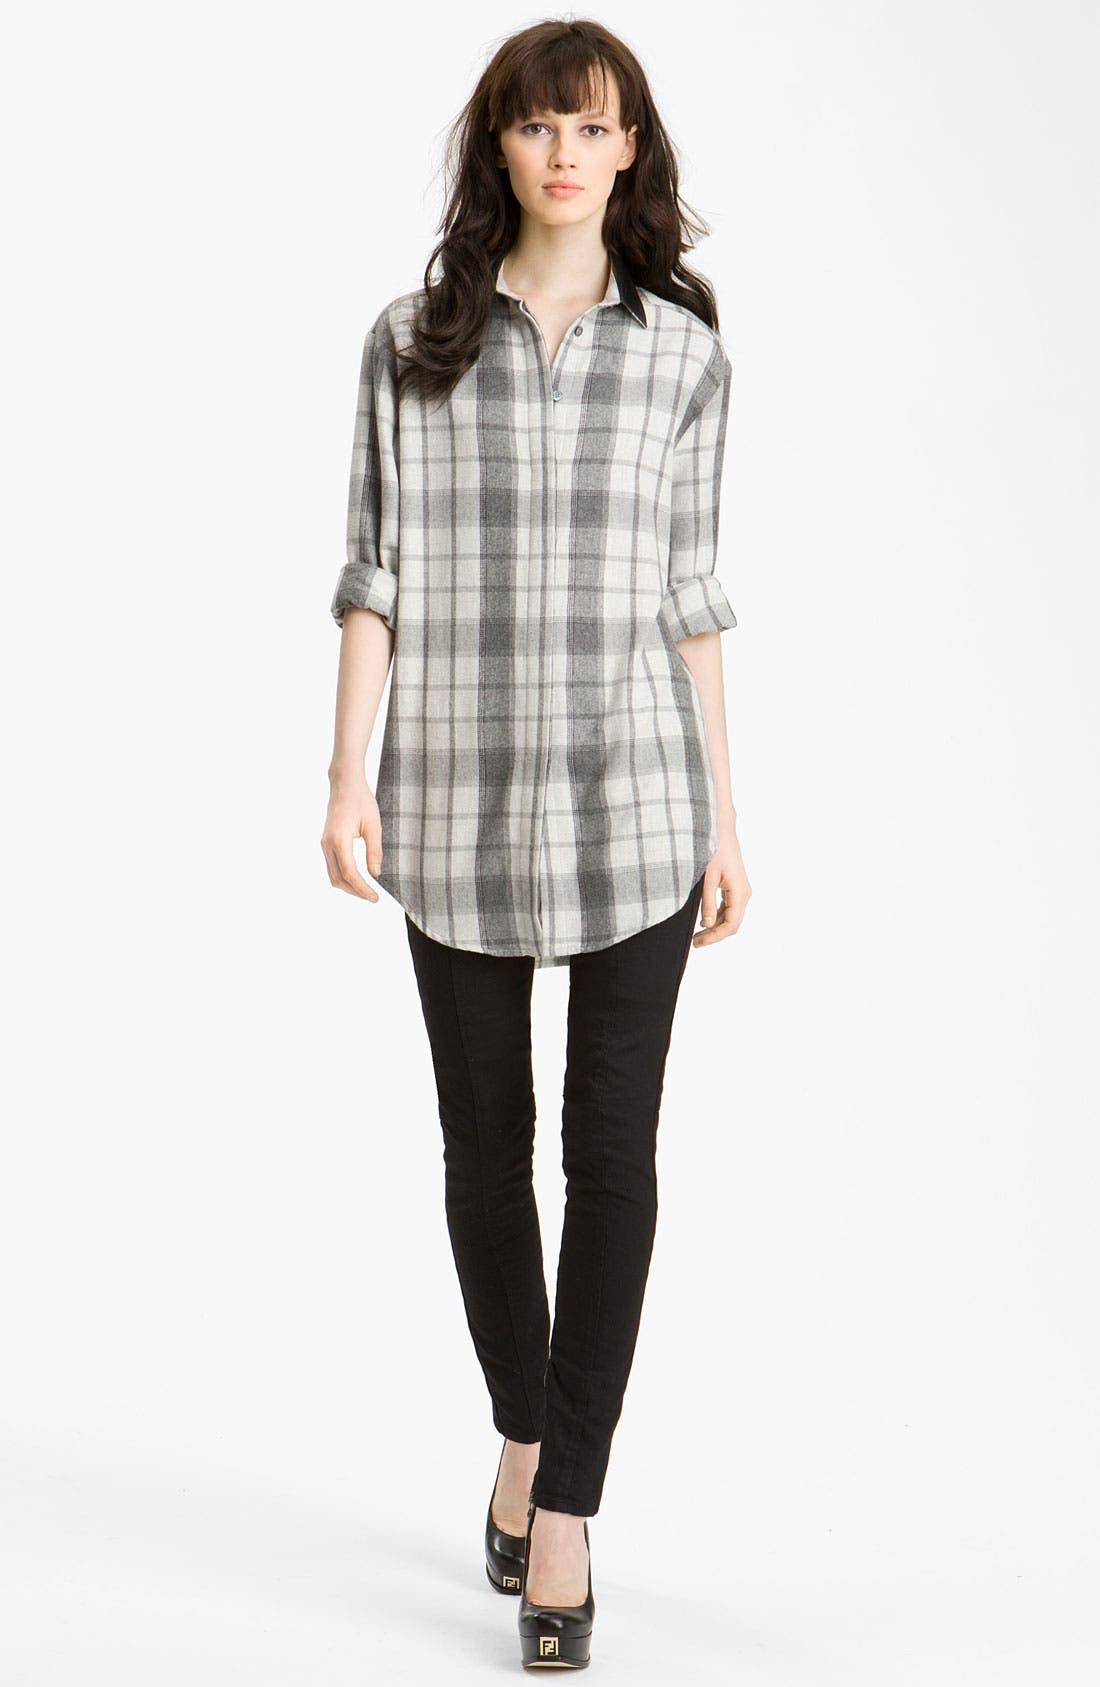 PIERRE BALMAIN Plaid Shirt, Main, color, 101